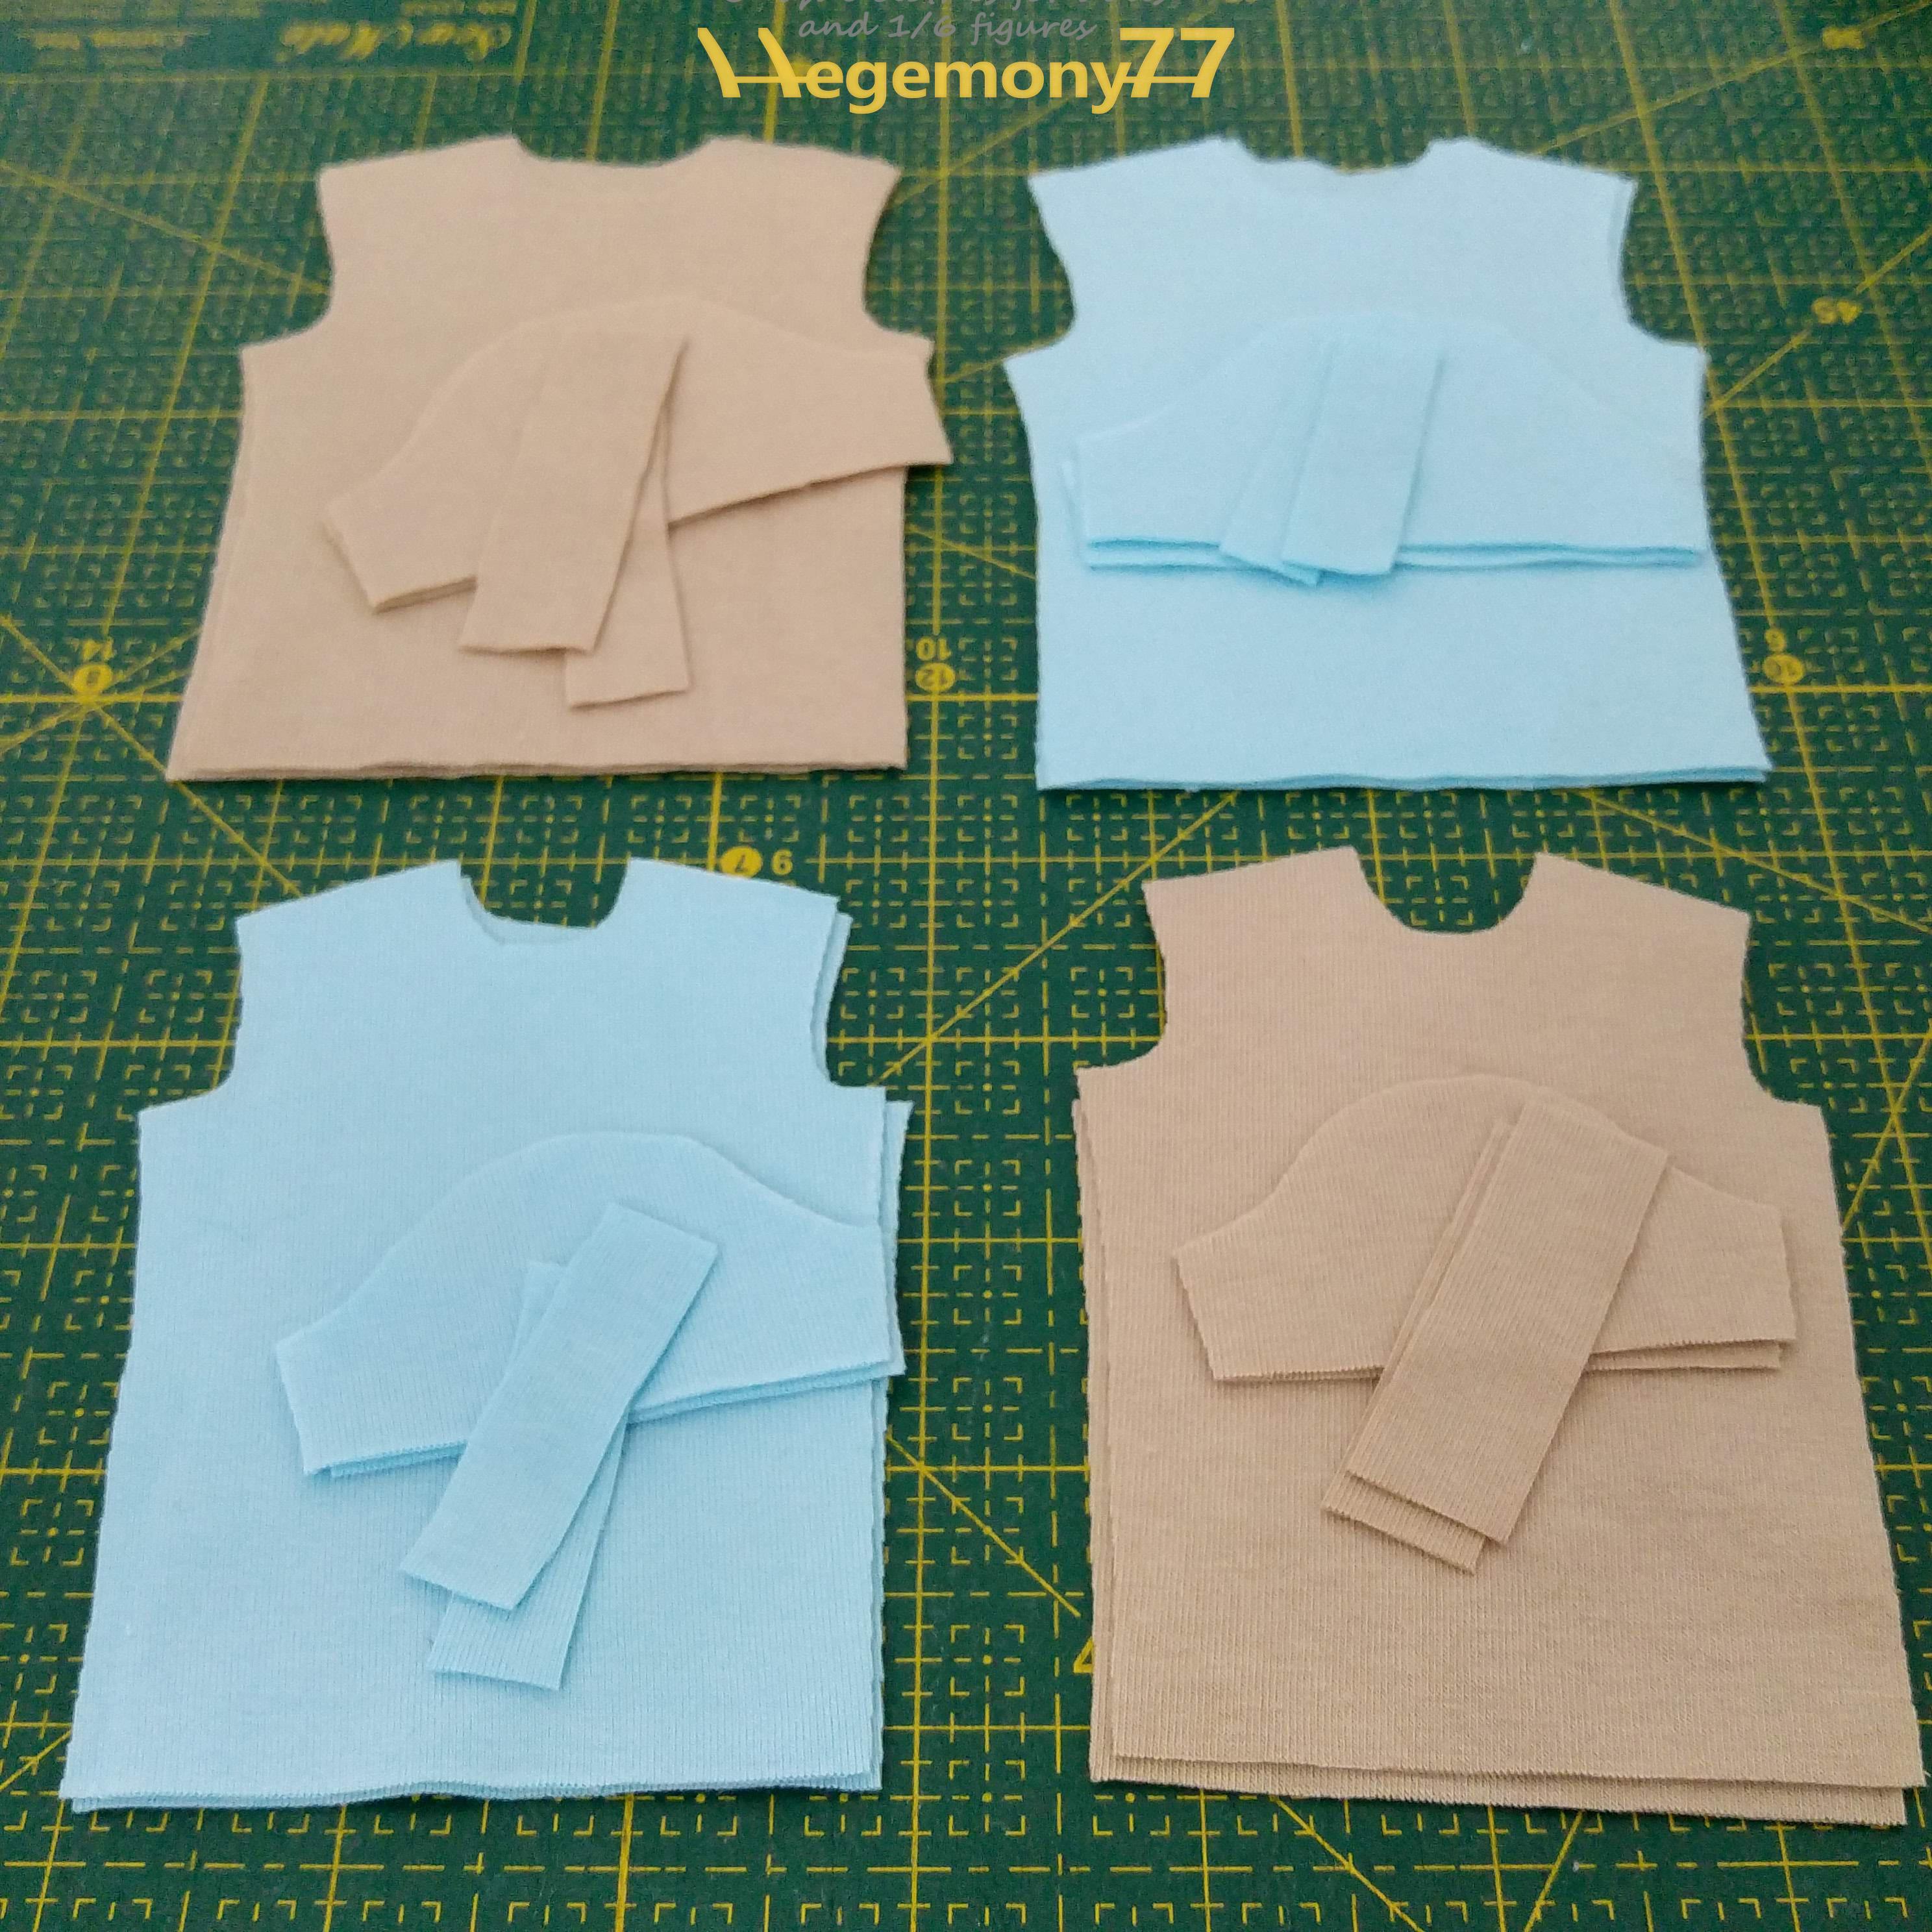 e9d81a8a9 1 6 scale custom made polo shirts - work in progress photo.jpg